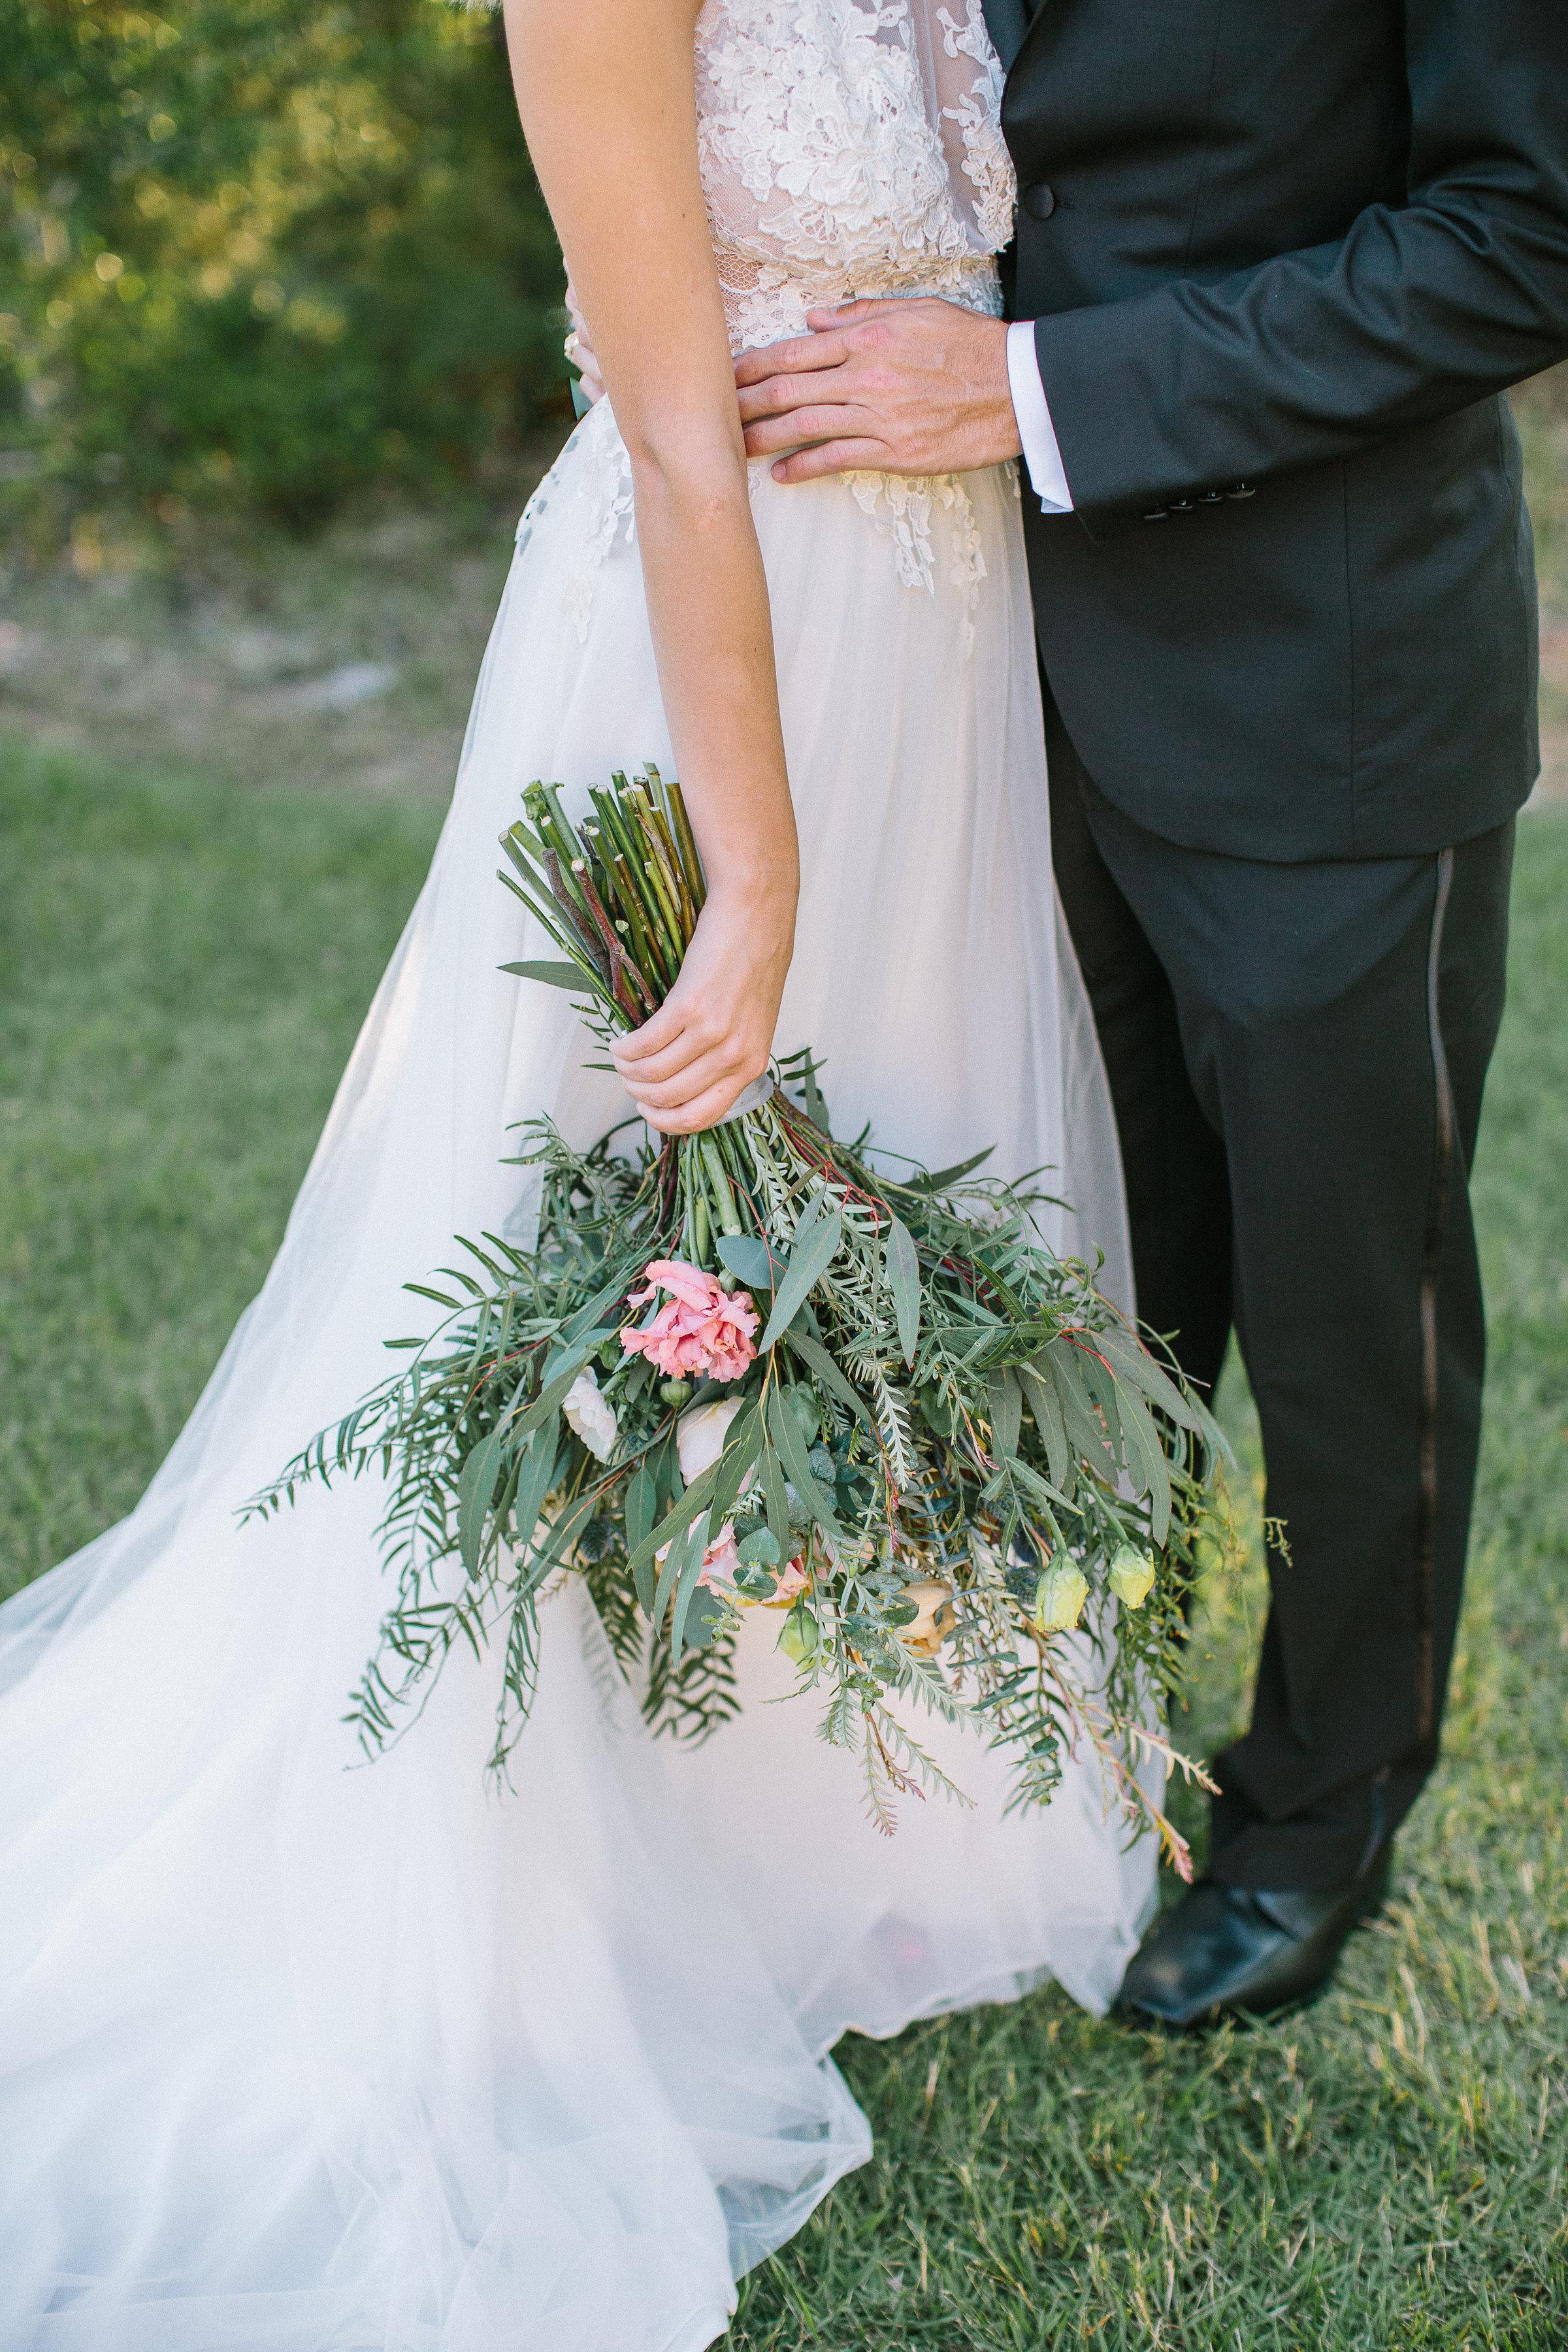 Ellen-Ashton-Photography-Peach-Creek-Ranch-Weddings-Wed-and-Prosper210